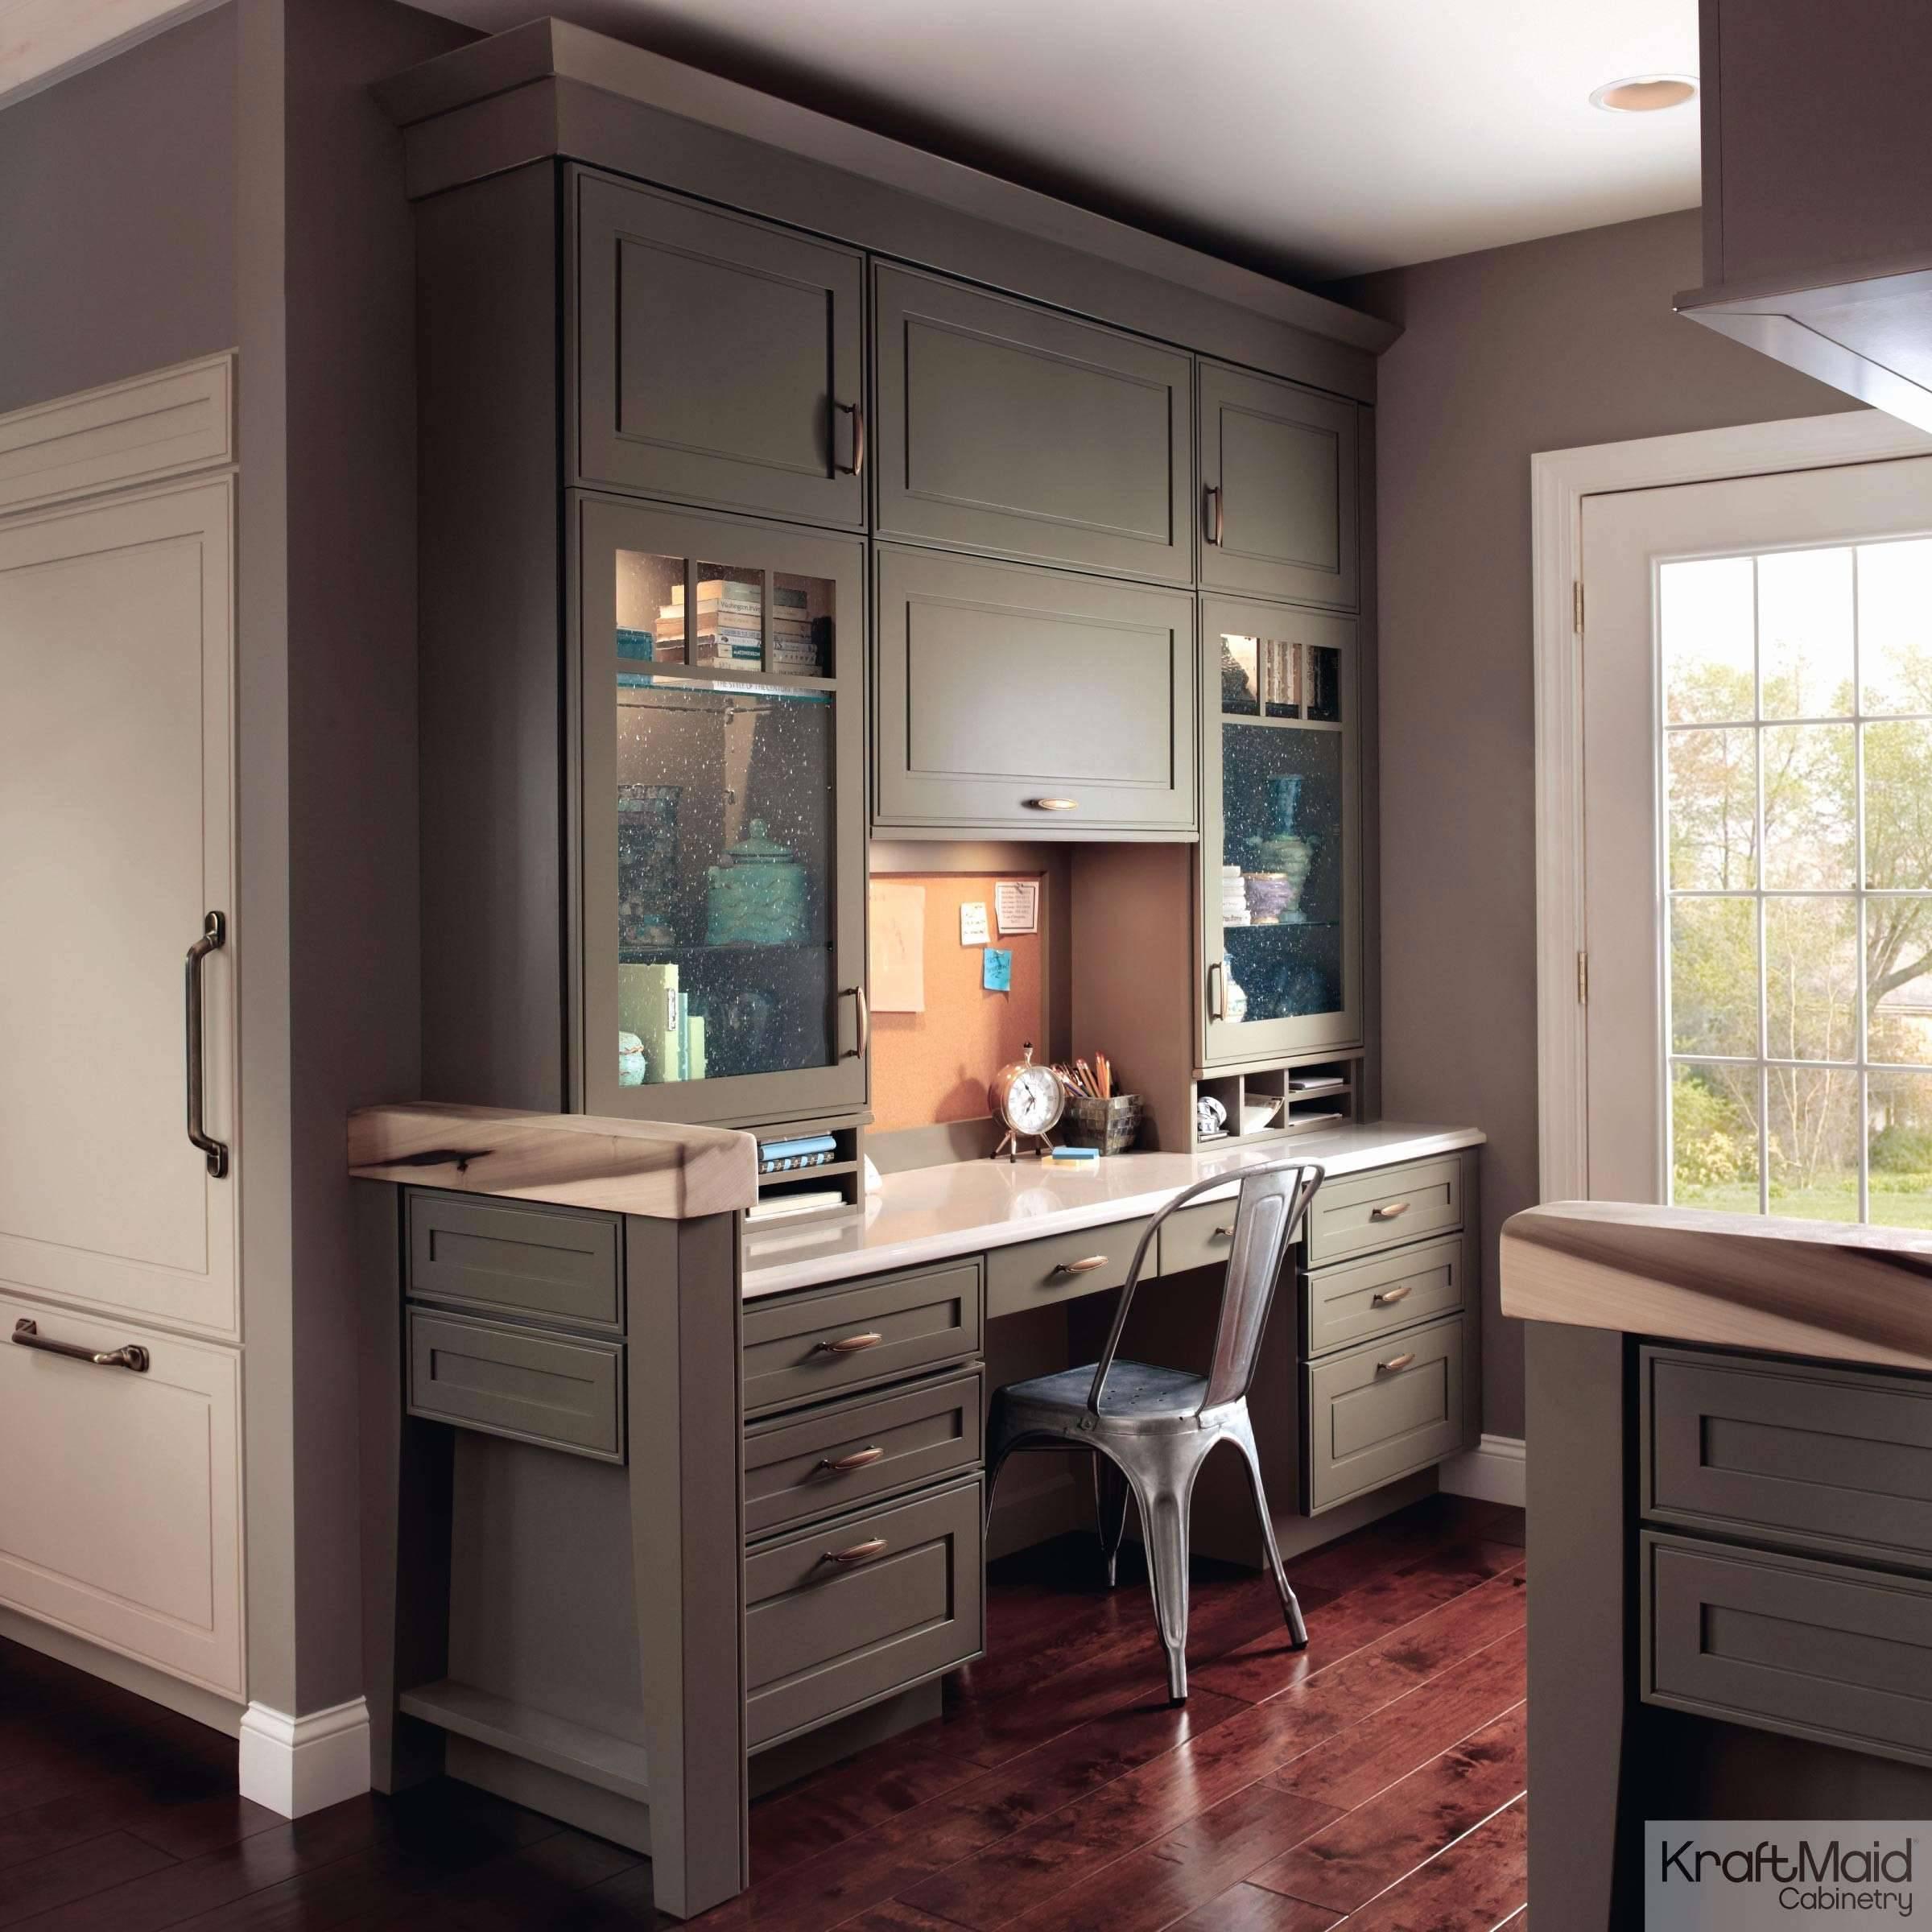 35 luxury backsplash ideas for small kitchen graph of black kitchen cabinets backsplash